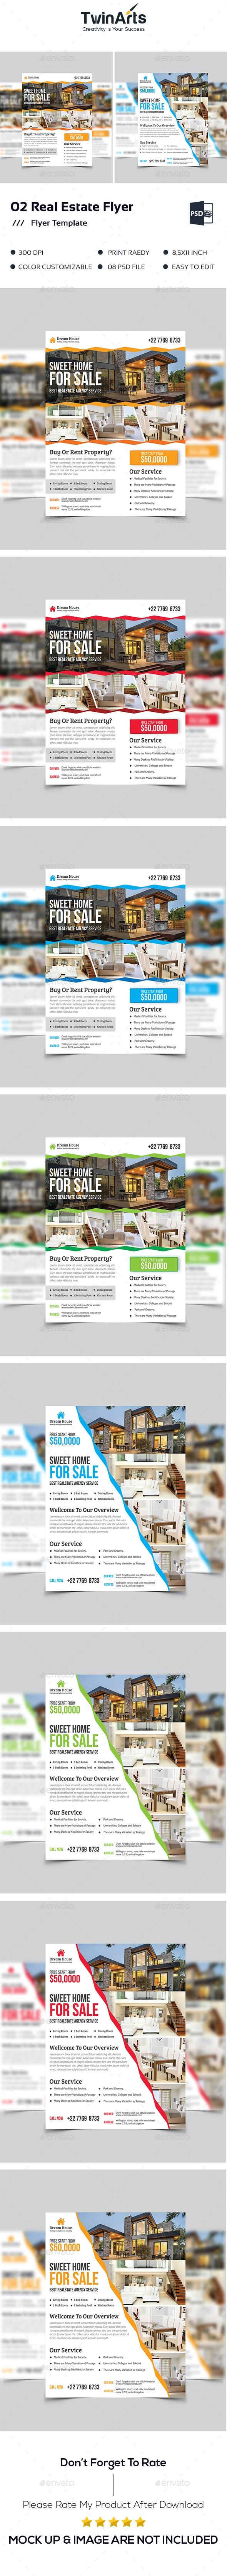 02 Real Estate Flyer - Flyers Print Templates